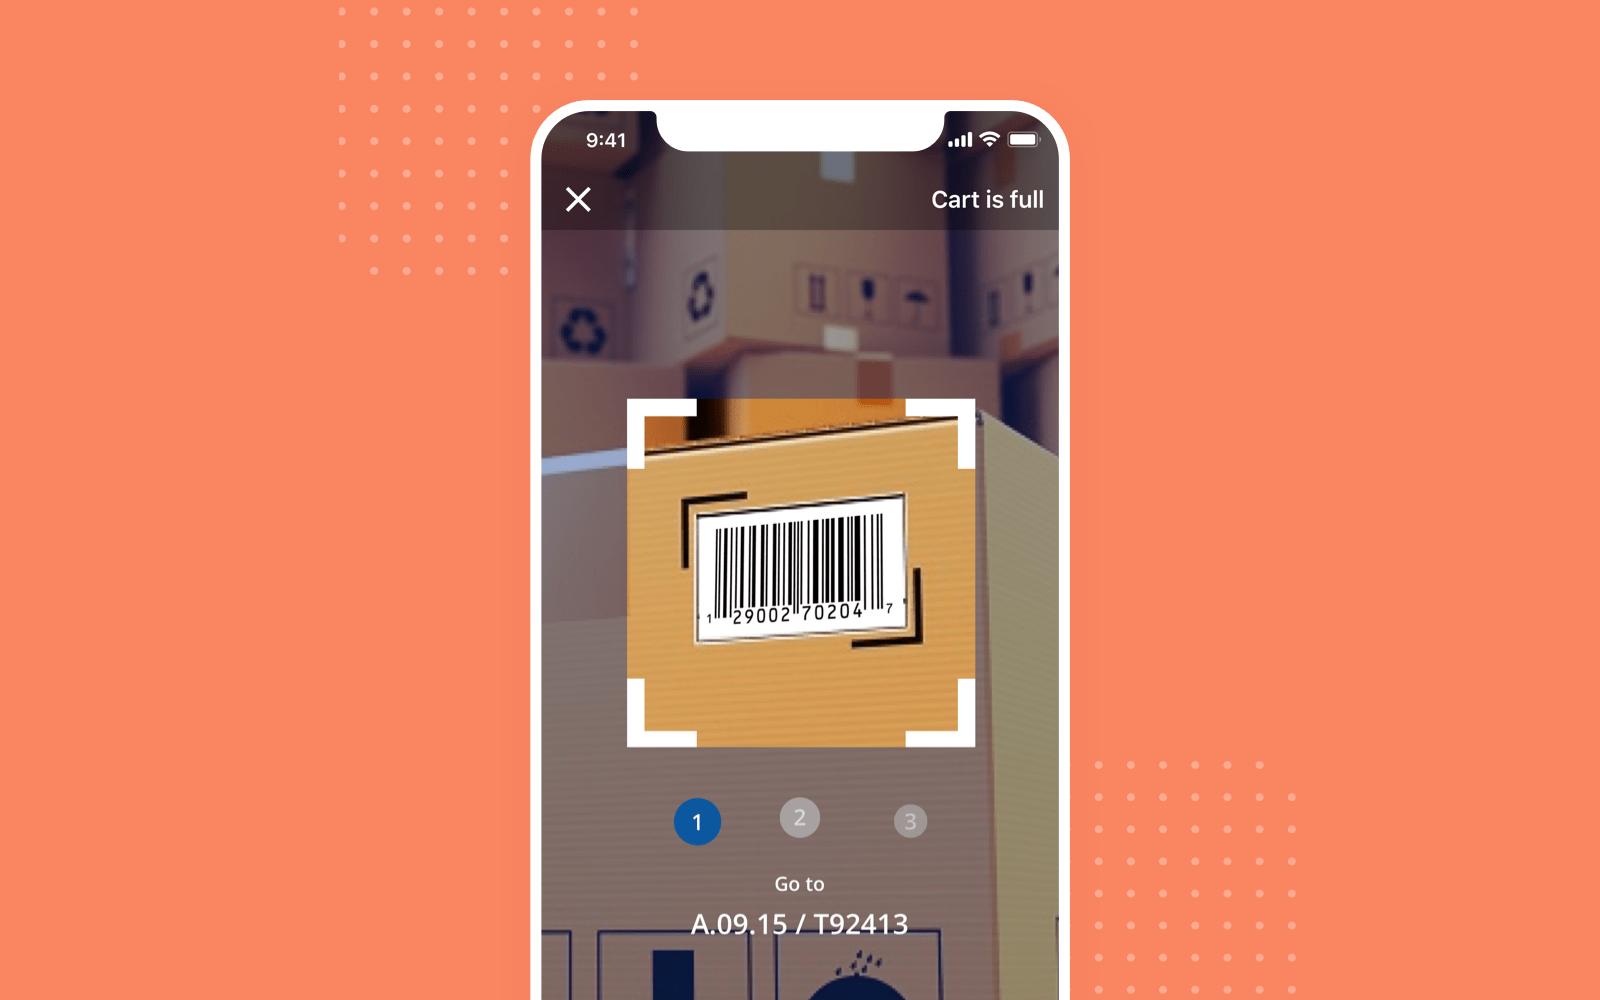 RetailOps scanning